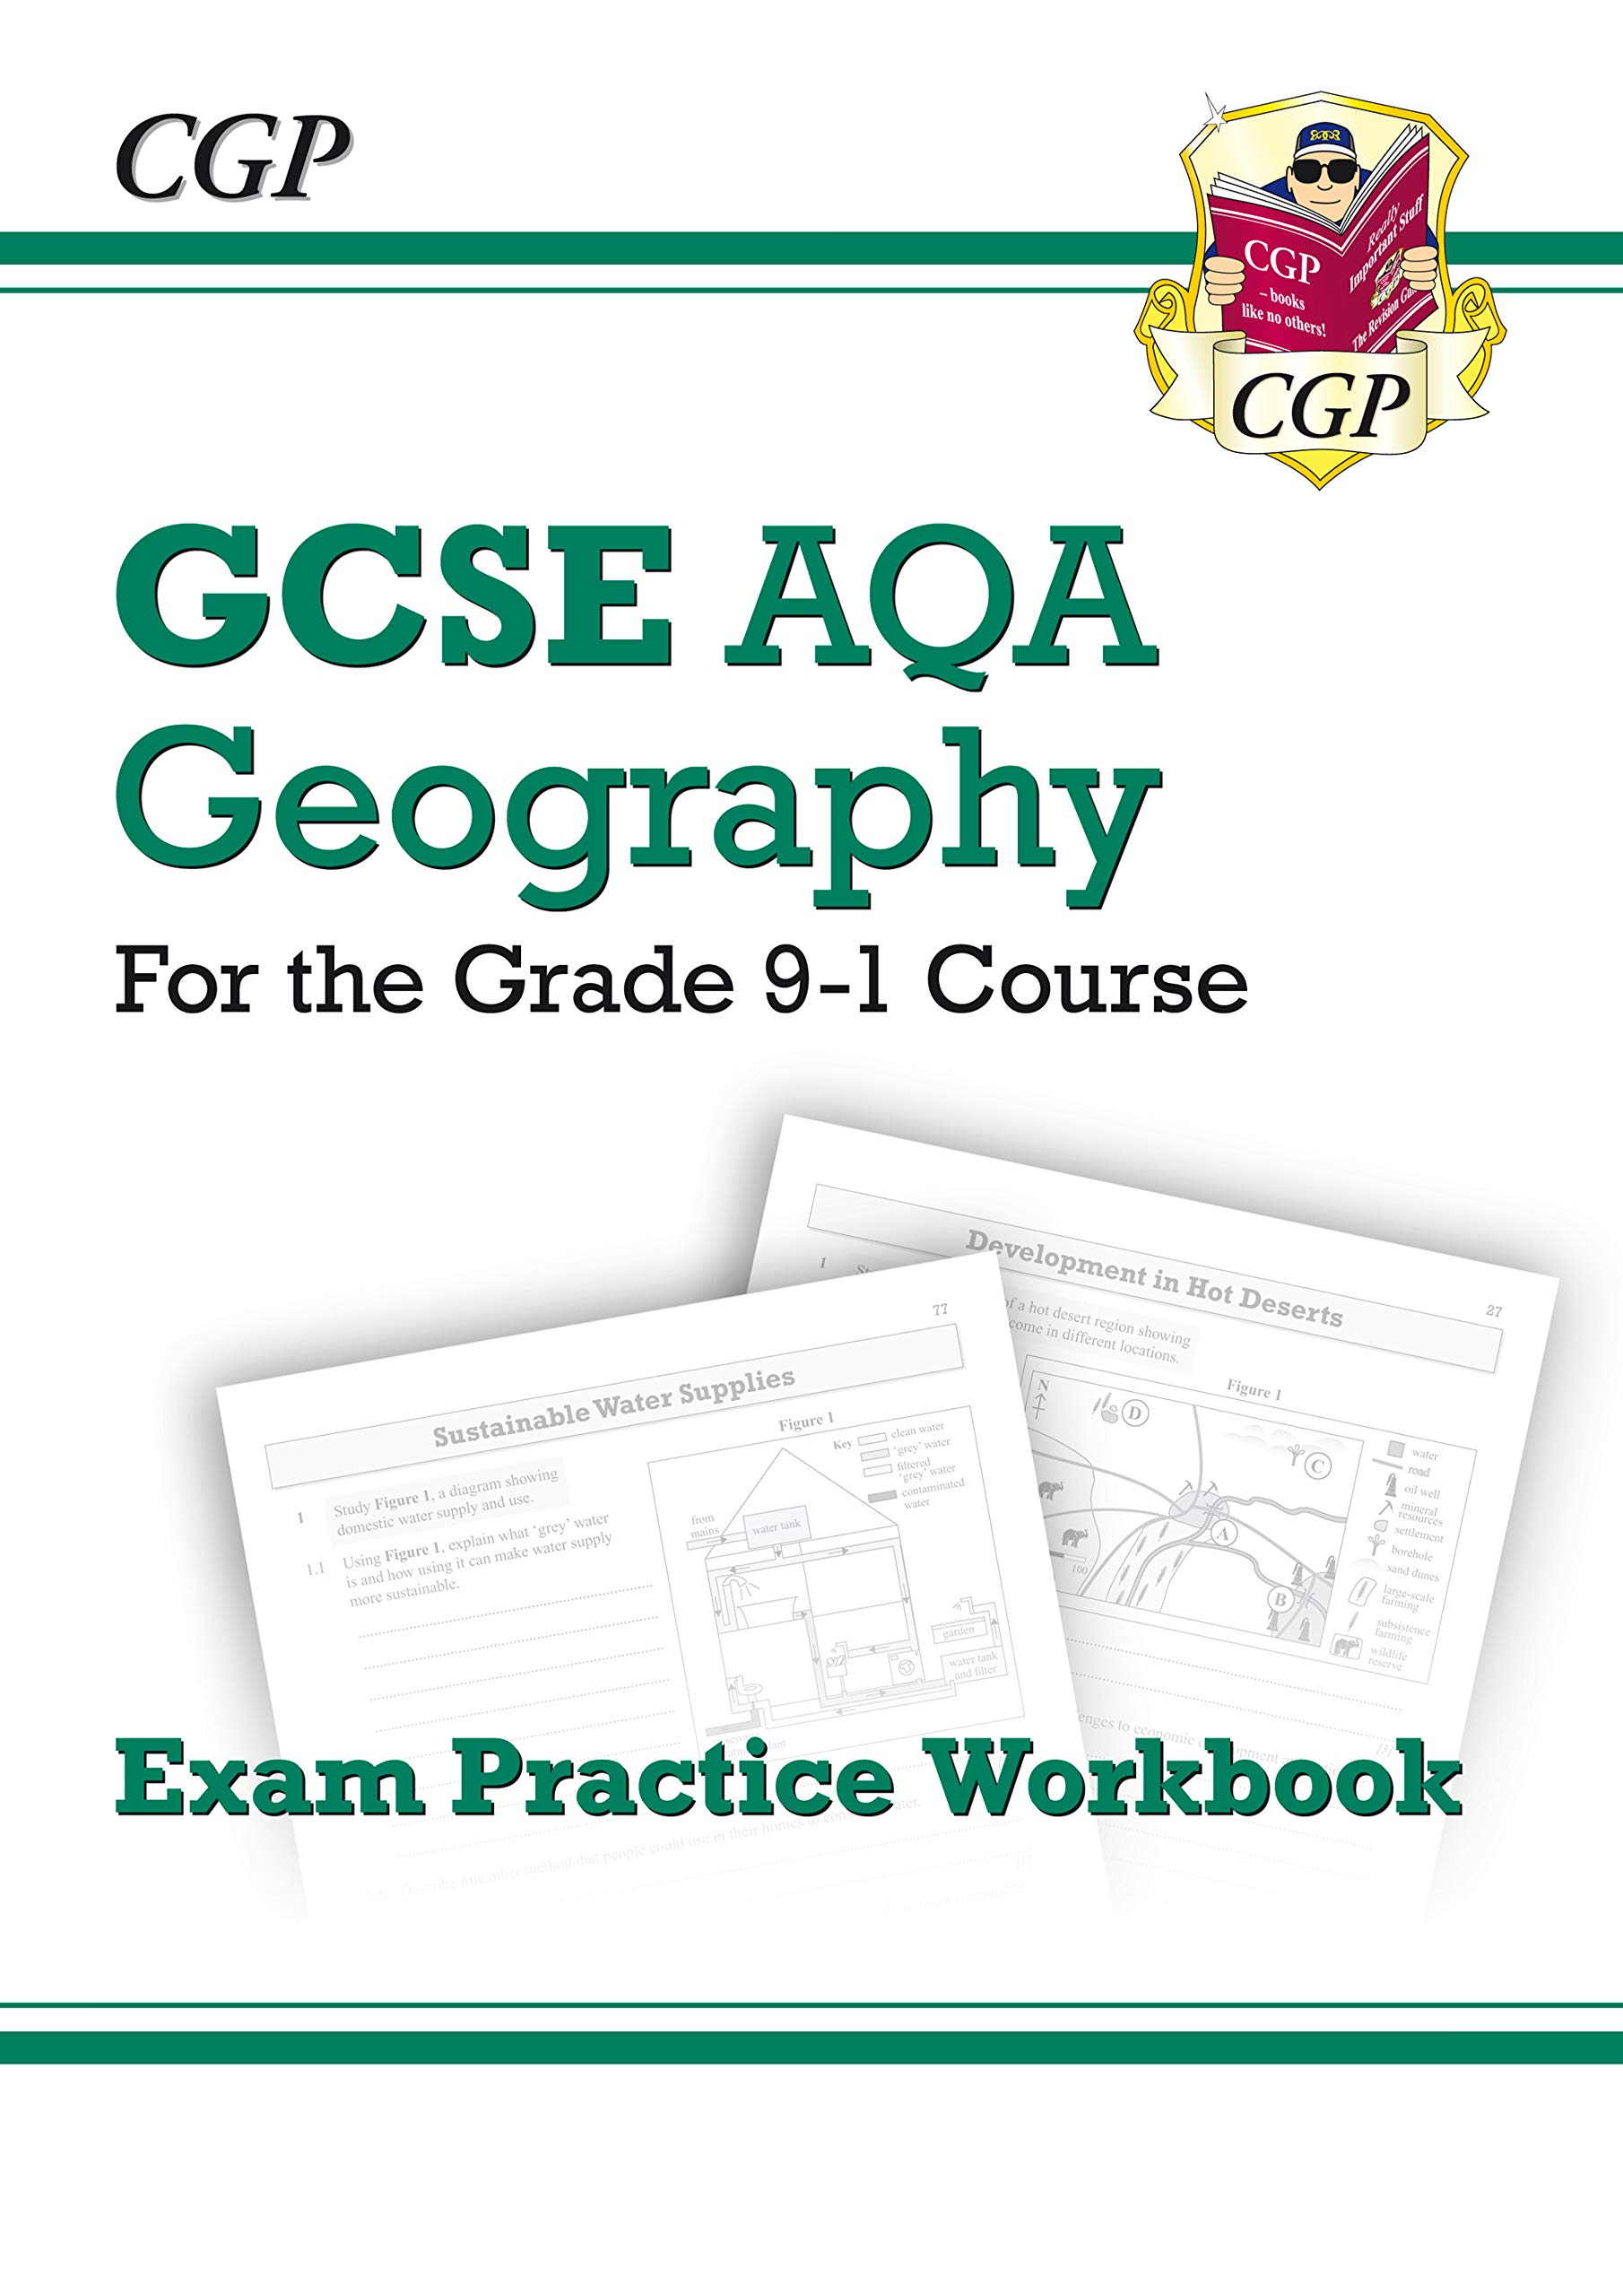 Grade 9 1 GCSE Geography AQA Exam Practice Workbook